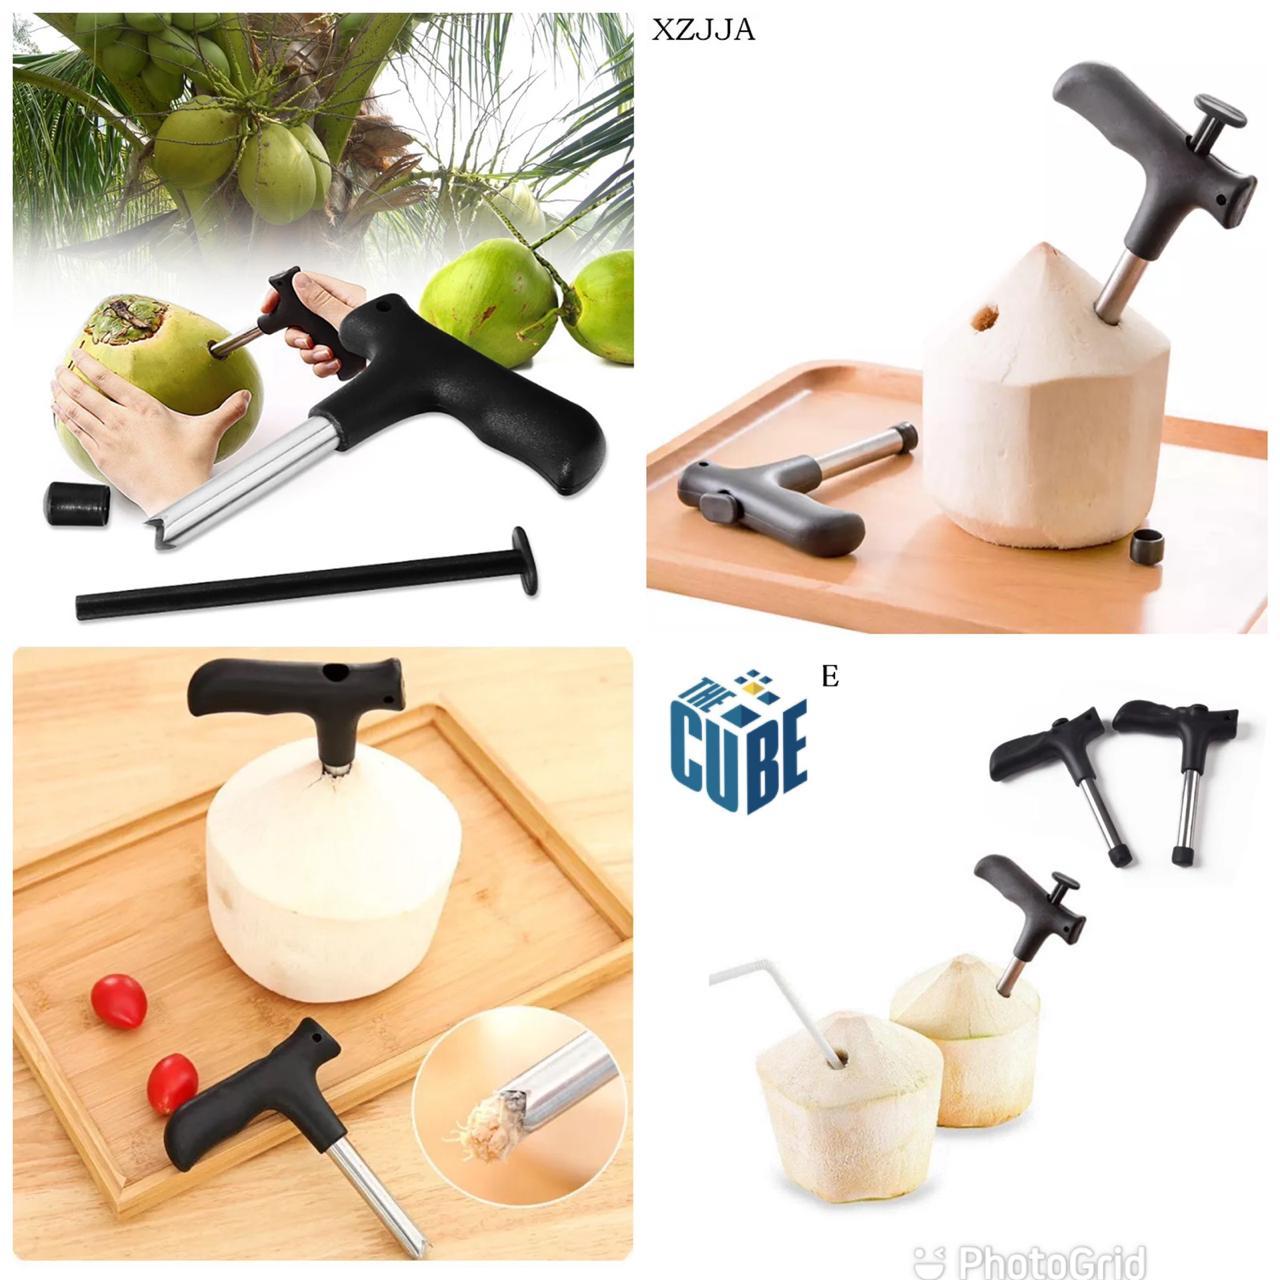 Coconut Driller